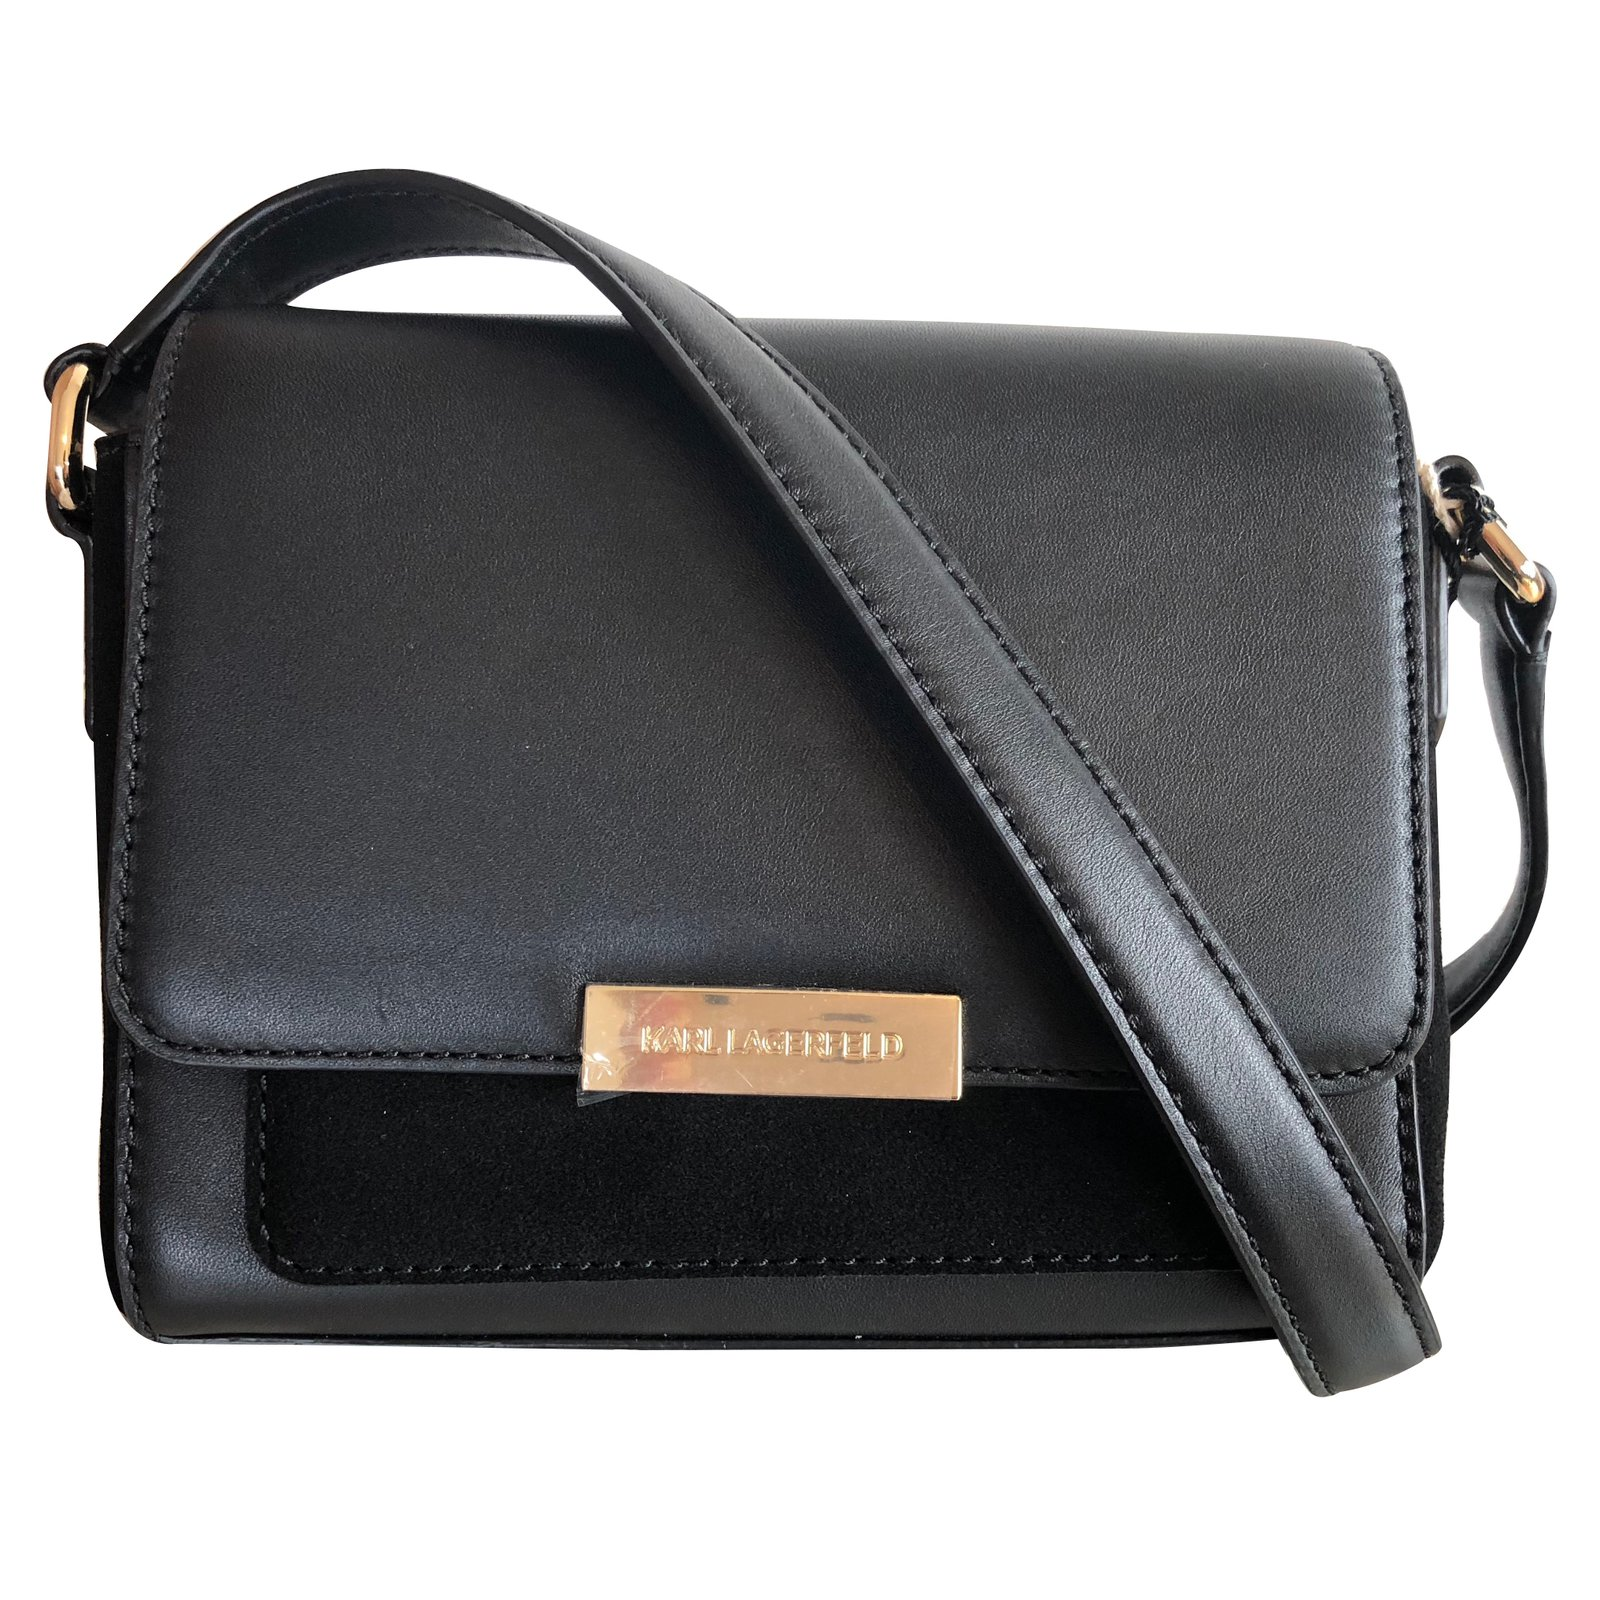 eb7147efa5 Karl Lagerfeld Handbags Handbags Leather Black Ref88944 Joli Closet